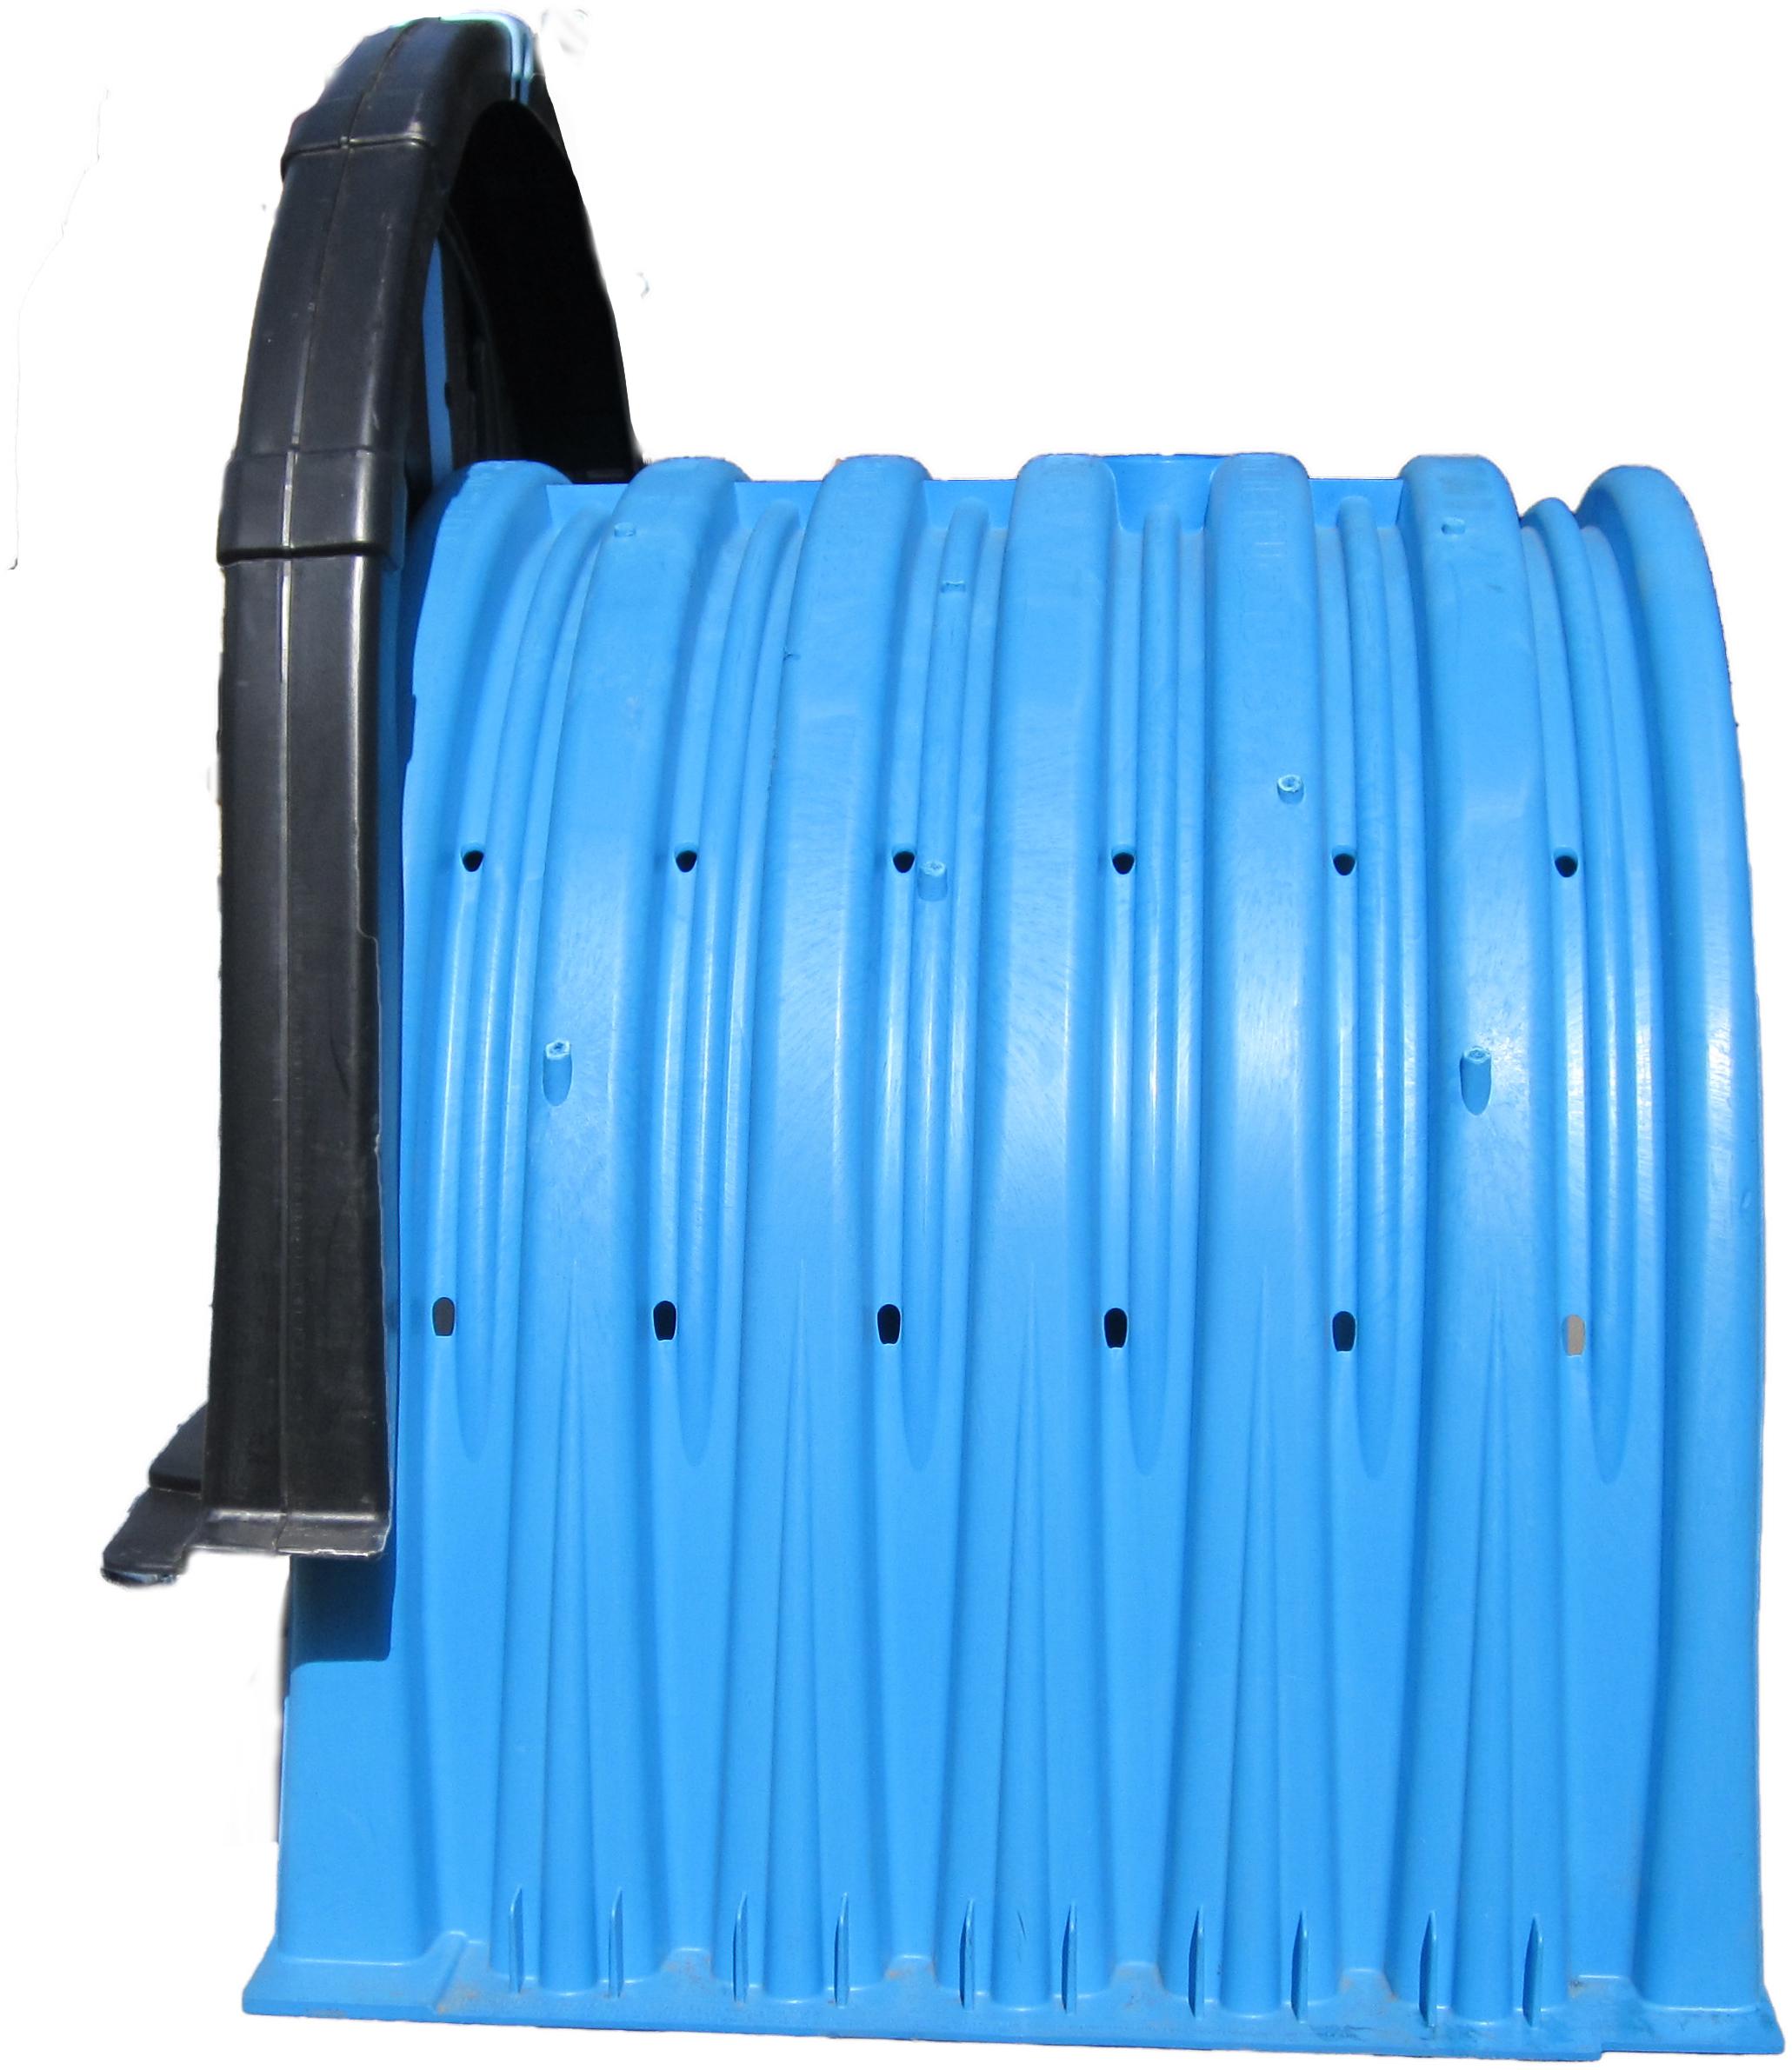 recharger-902hd-end-cap-install-1